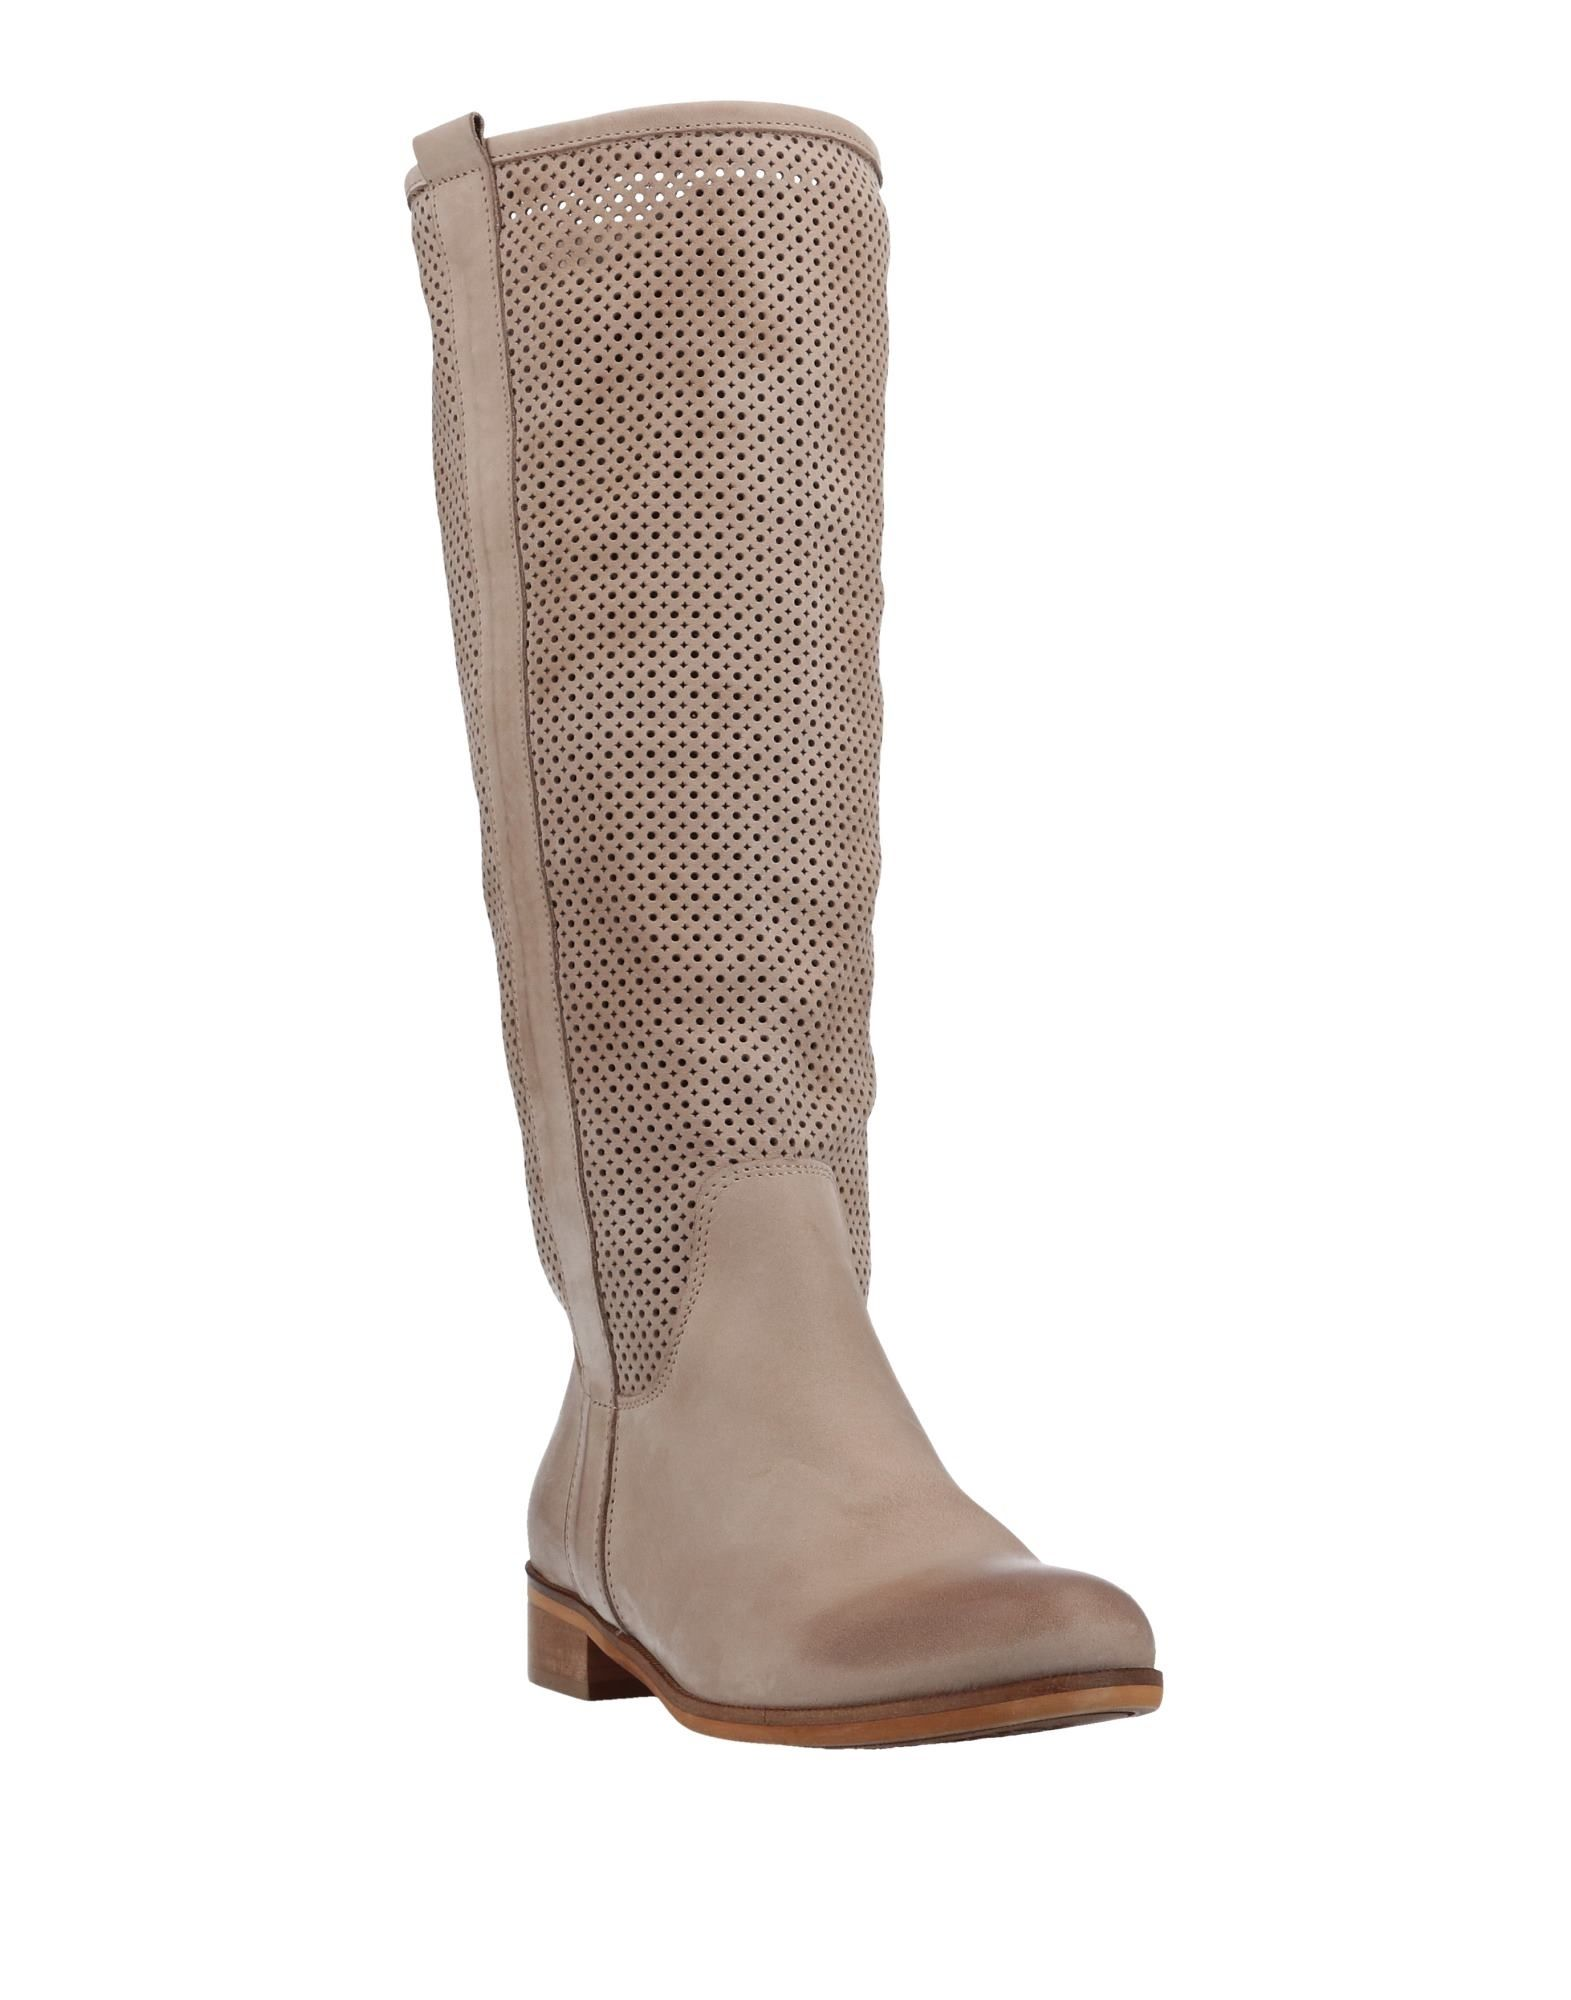 Piranha Stiefel Damen beliebte  11506241GU Gute Qualität beliebte Damen Schuhe 2faaa2